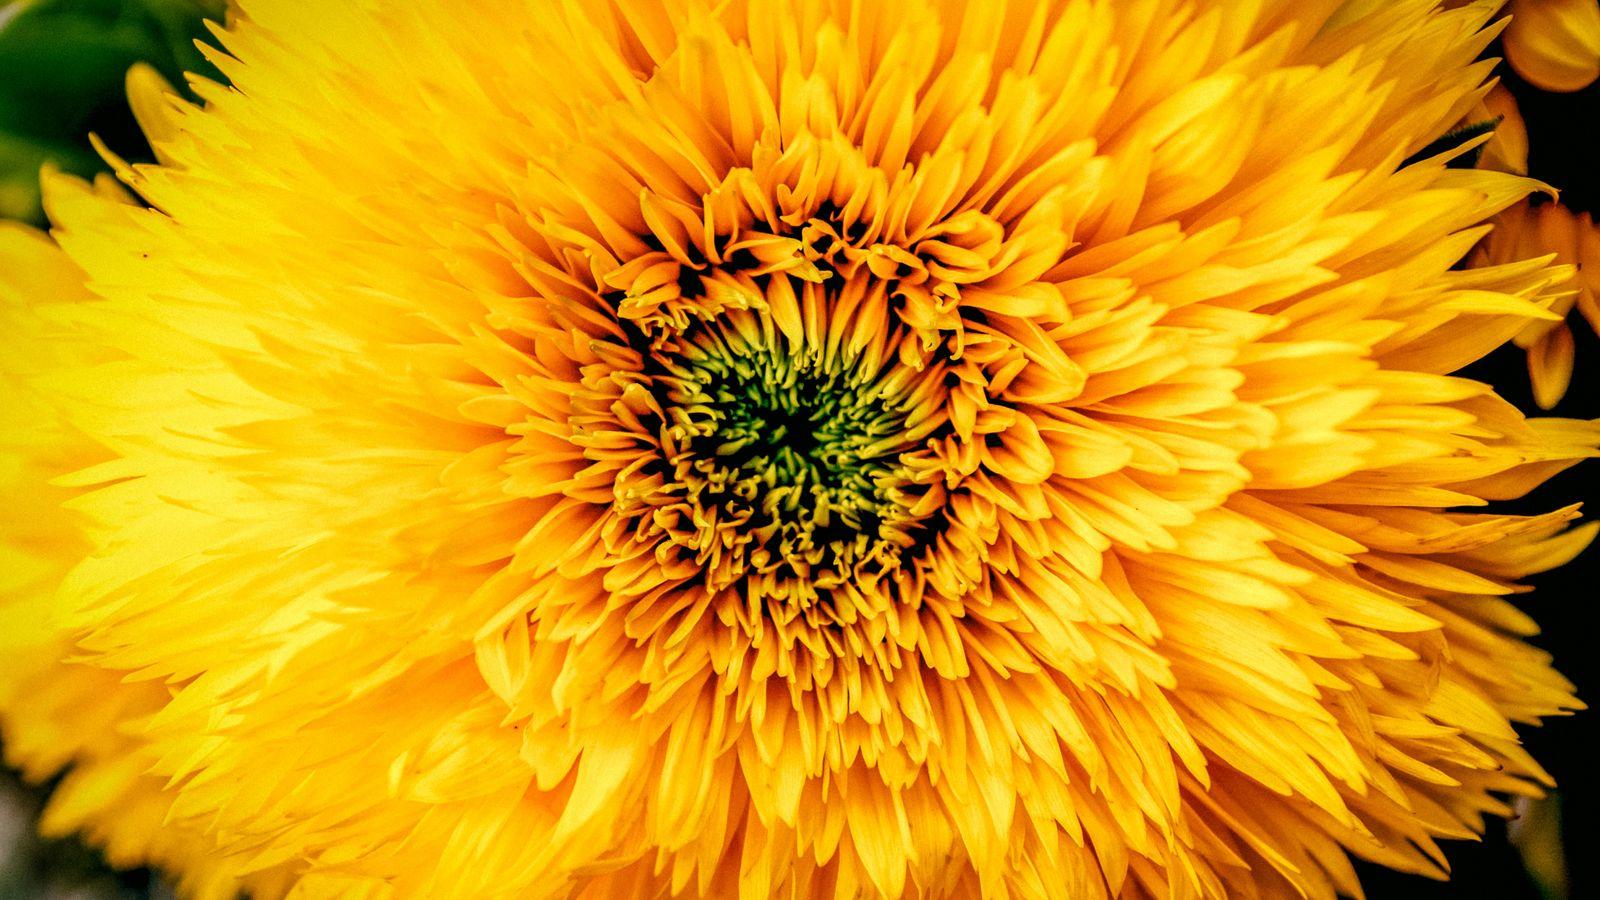 1600x900 Wallpaper chrysanthemum, yellow, petals, bud